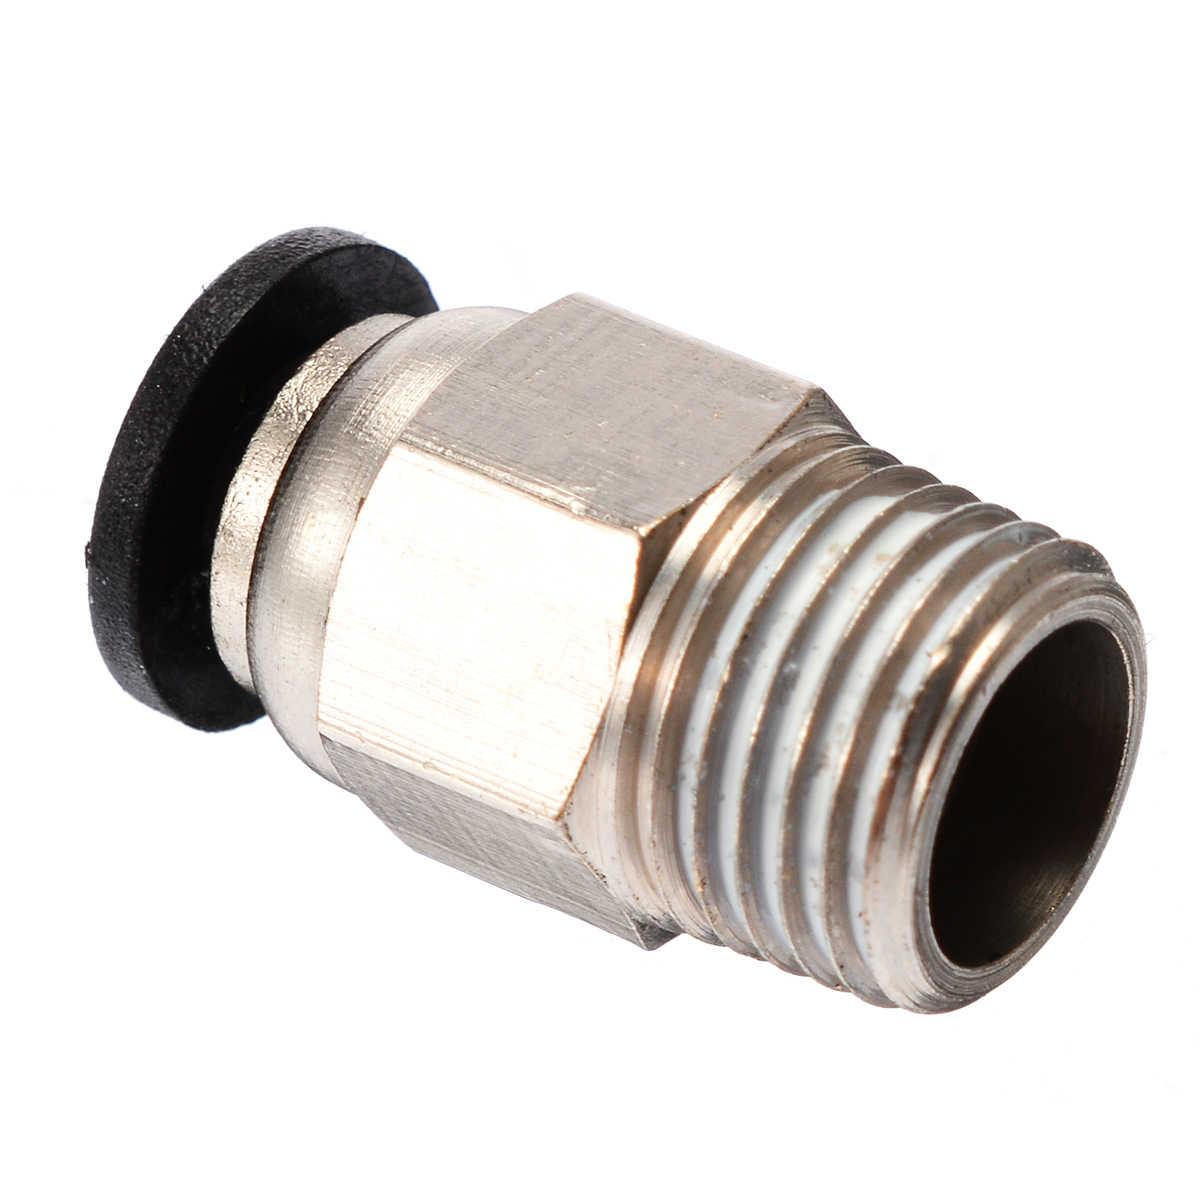 Mayitr 5/10 قطعة دفع في الإفراج السريع المناسب موصل طابعة ثلاثية الأبعاد أنبوب موصلات ل ثلاثية الأبعاد V6 PC4-M10 مستقيم أنبوب